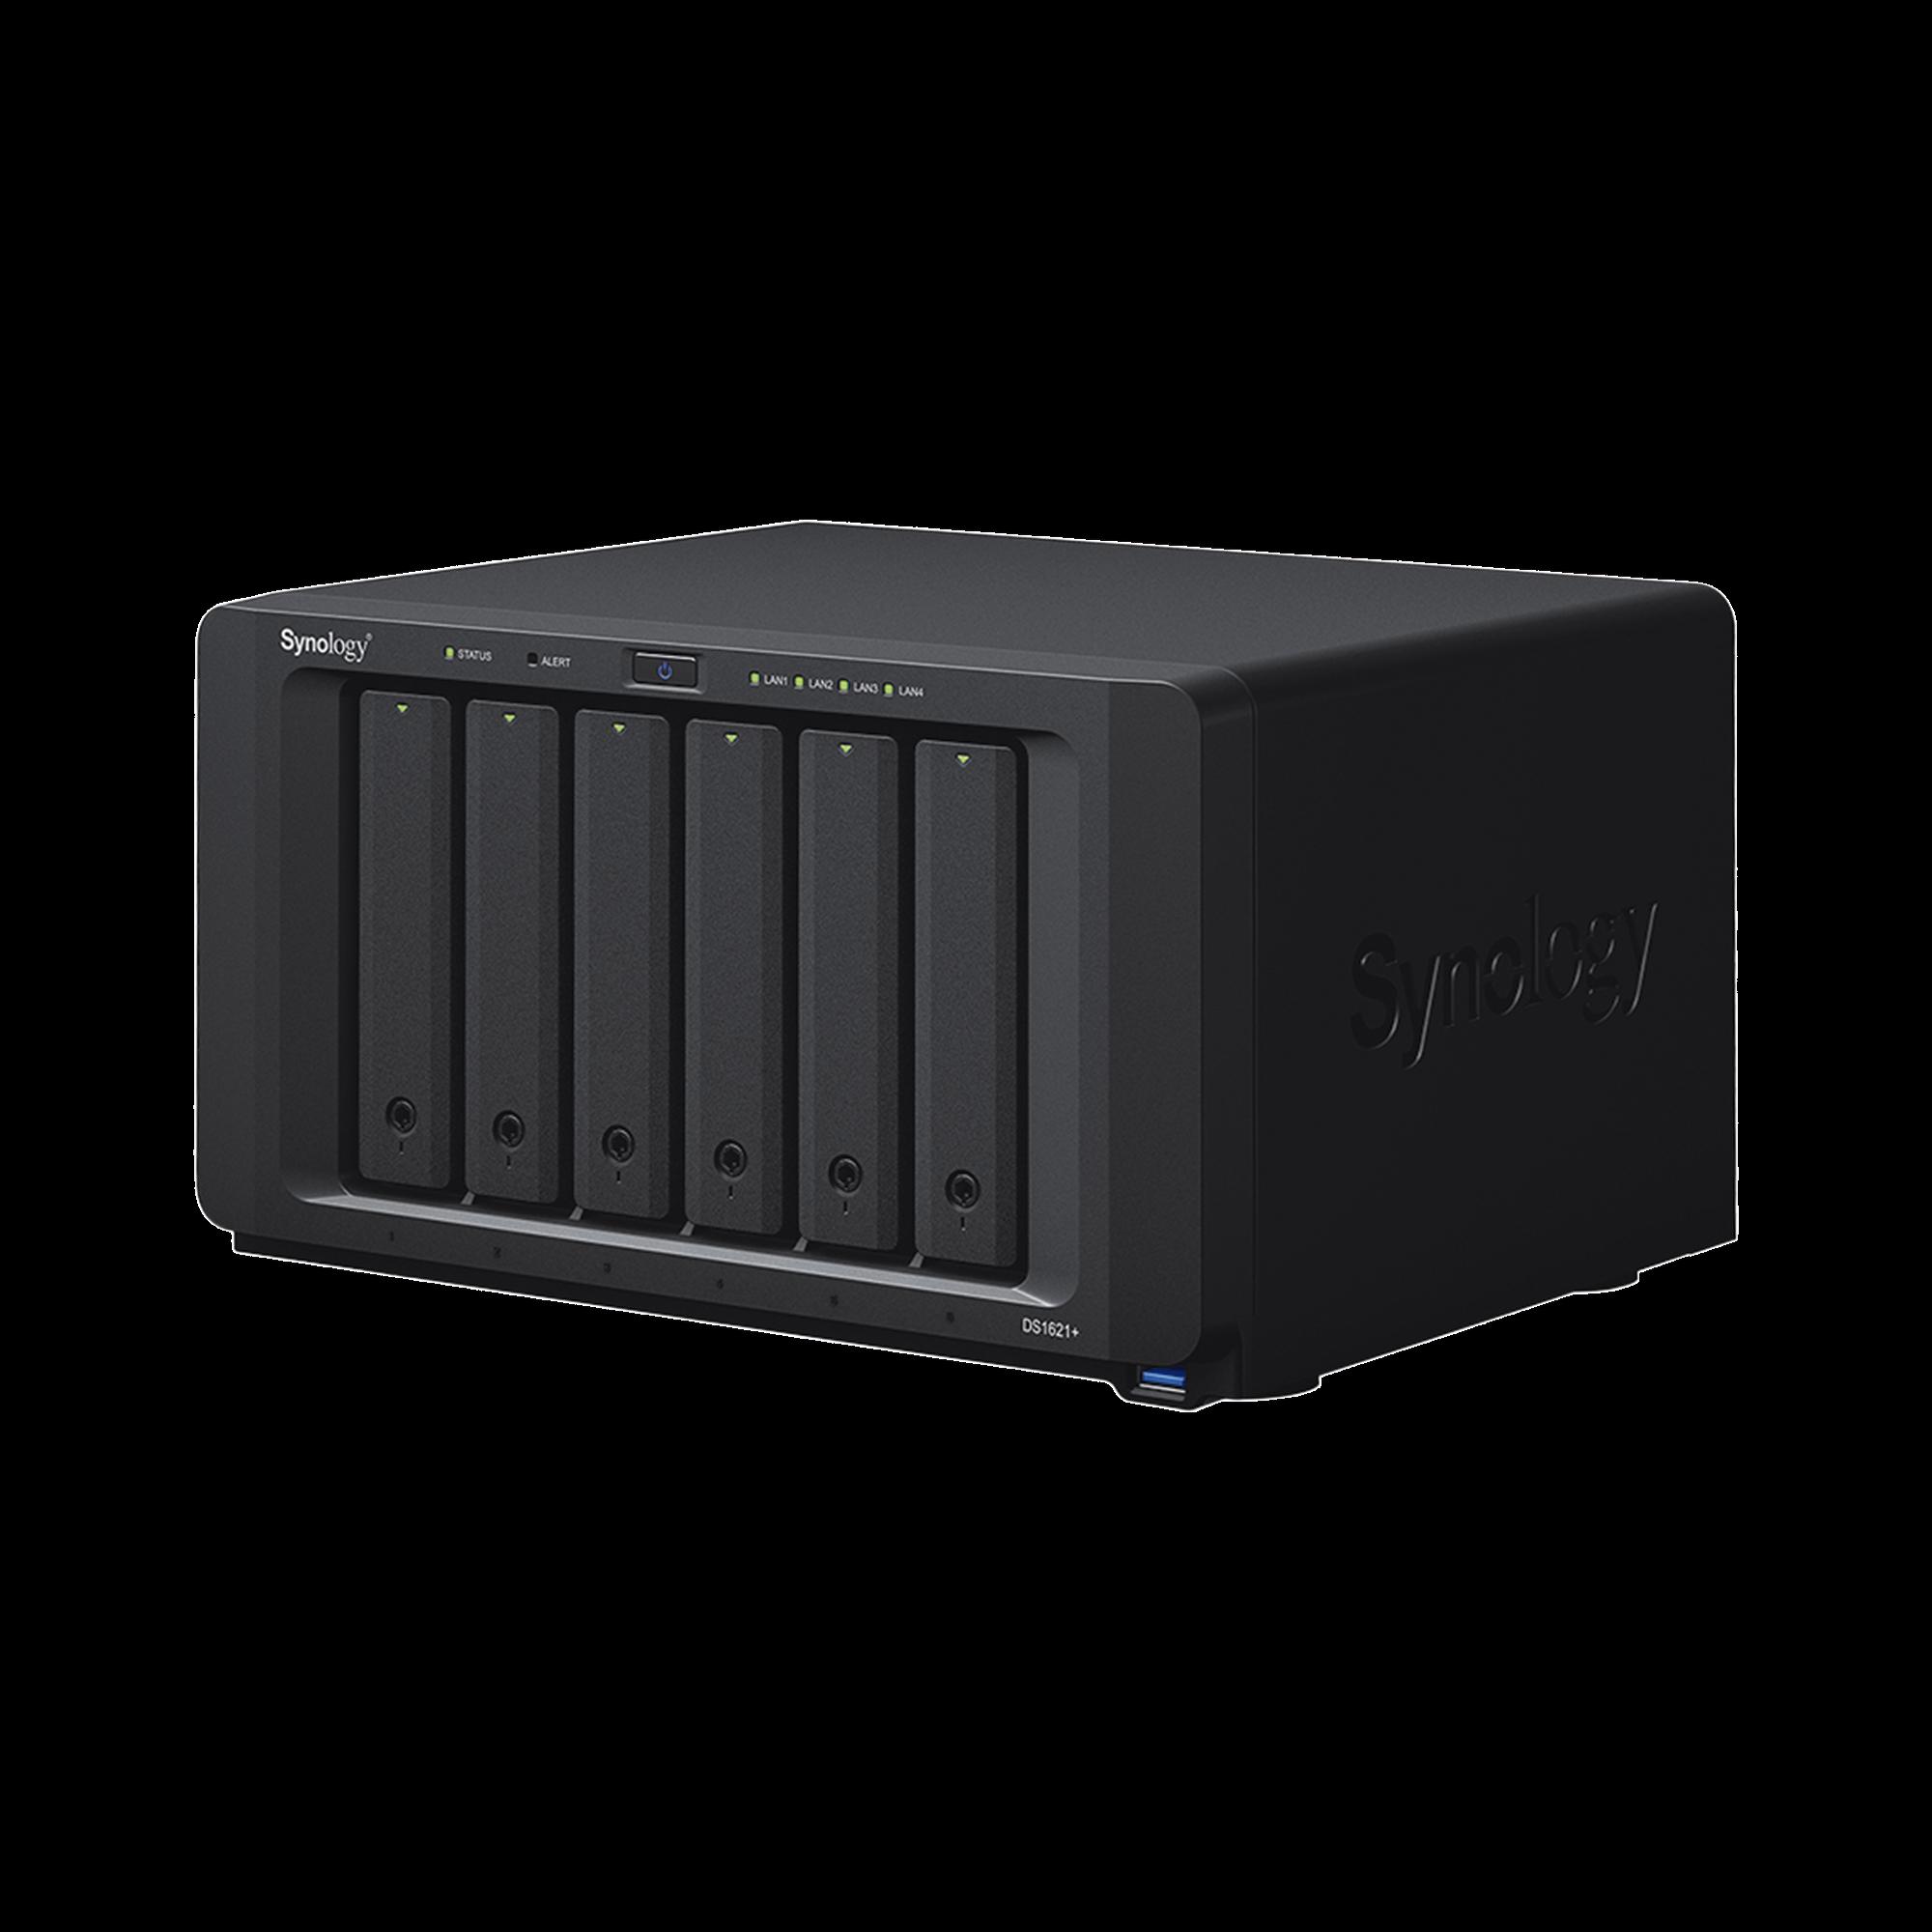 Servidor NAS de escritorio de 6 bahias / Expandible a 16 bahías / Hasta 256TB / Hasta 32GB de RAM